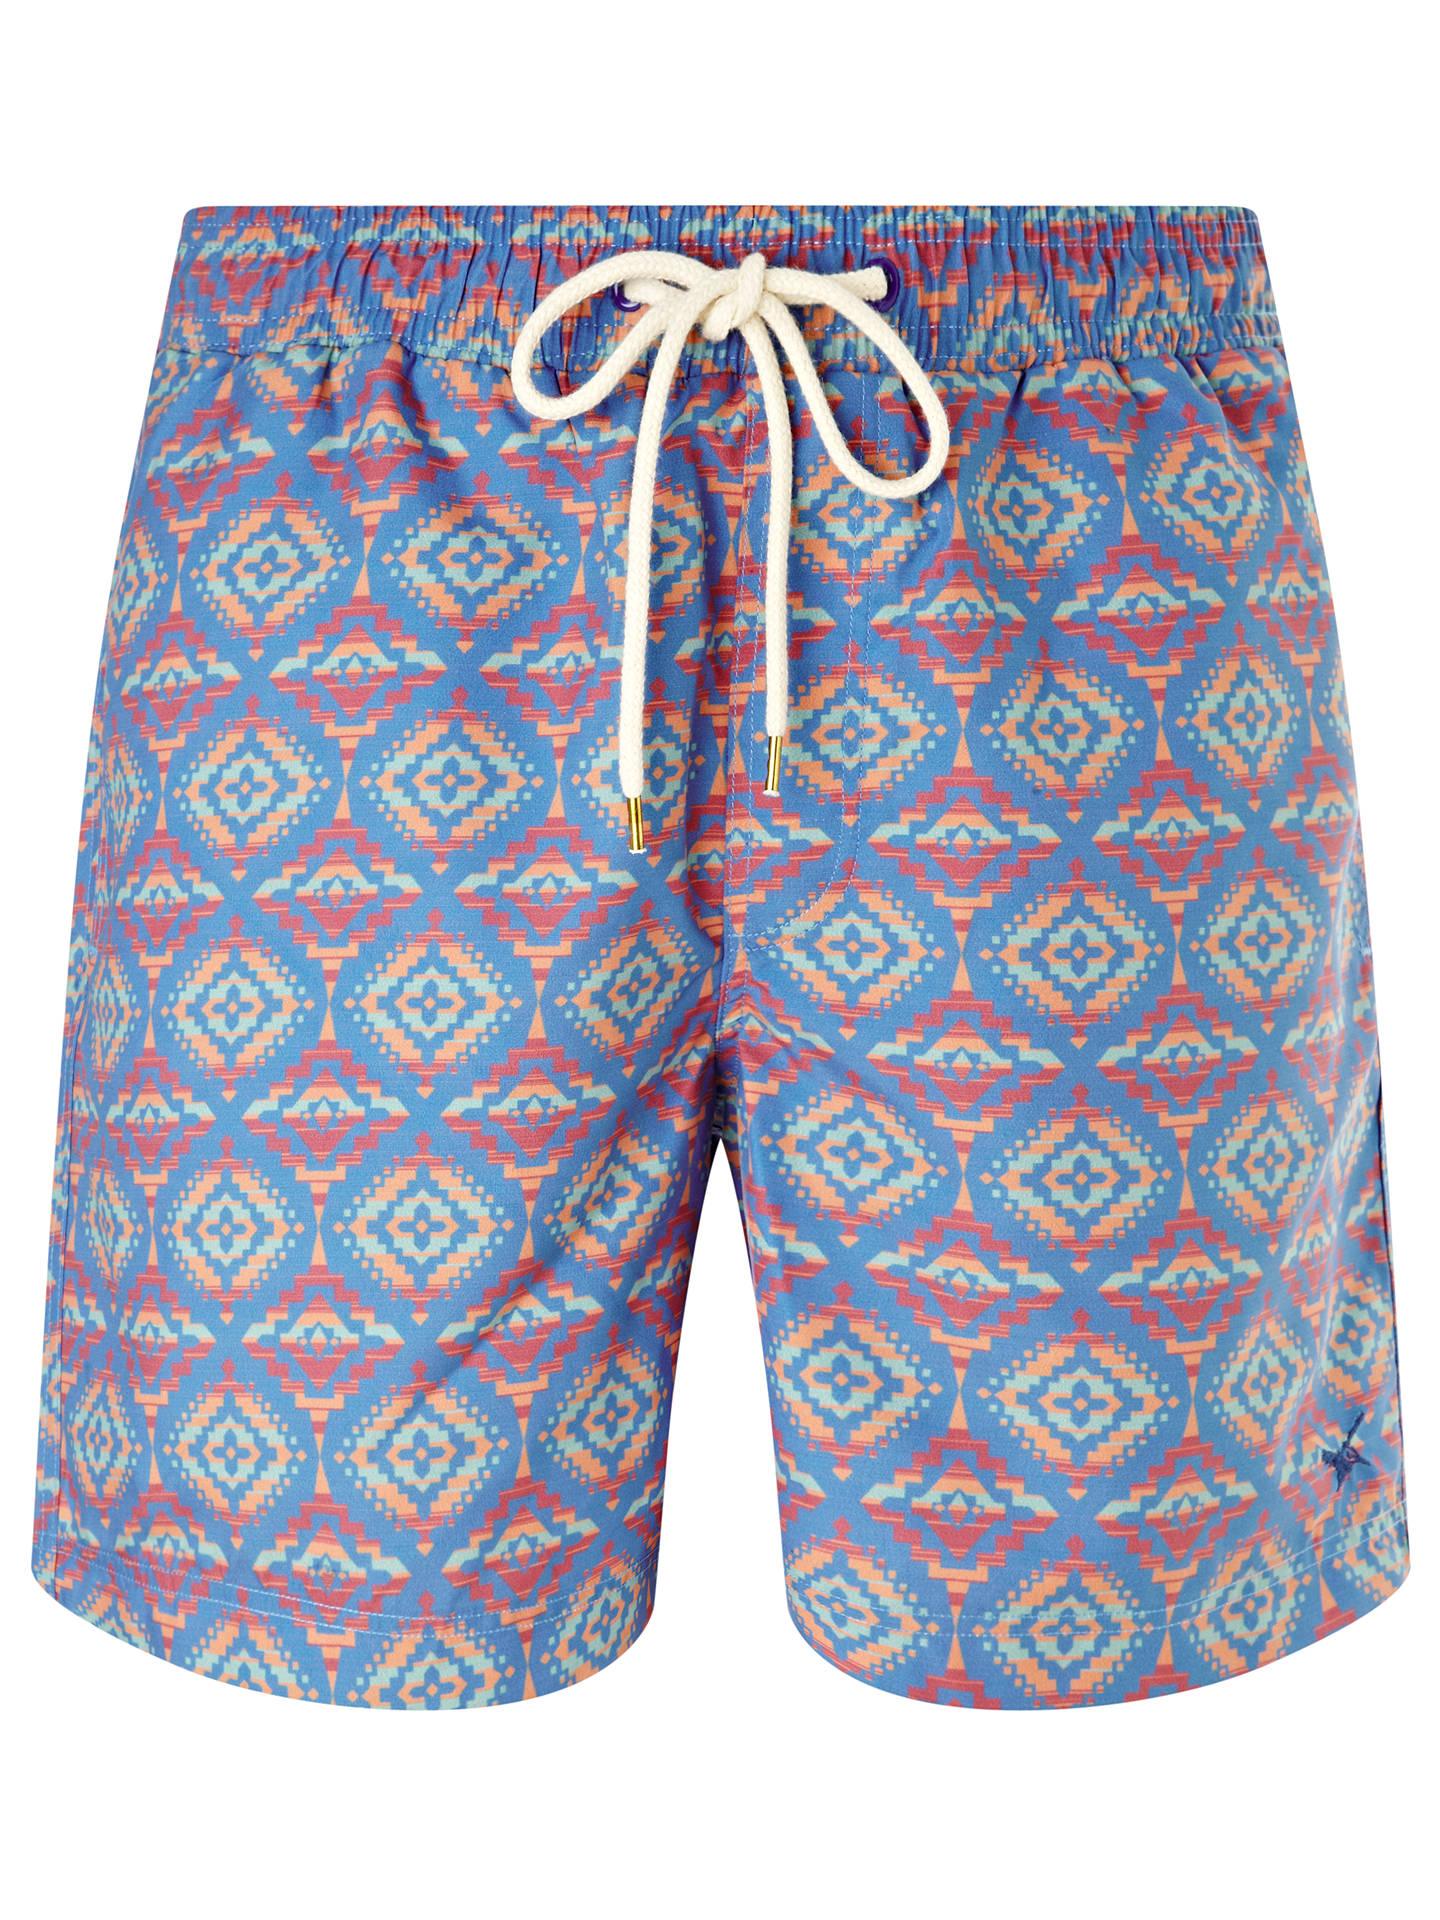 e8602e1a2 Gandys for John Lewis Aztec Print Swim Shorts at John Lewis & Partners